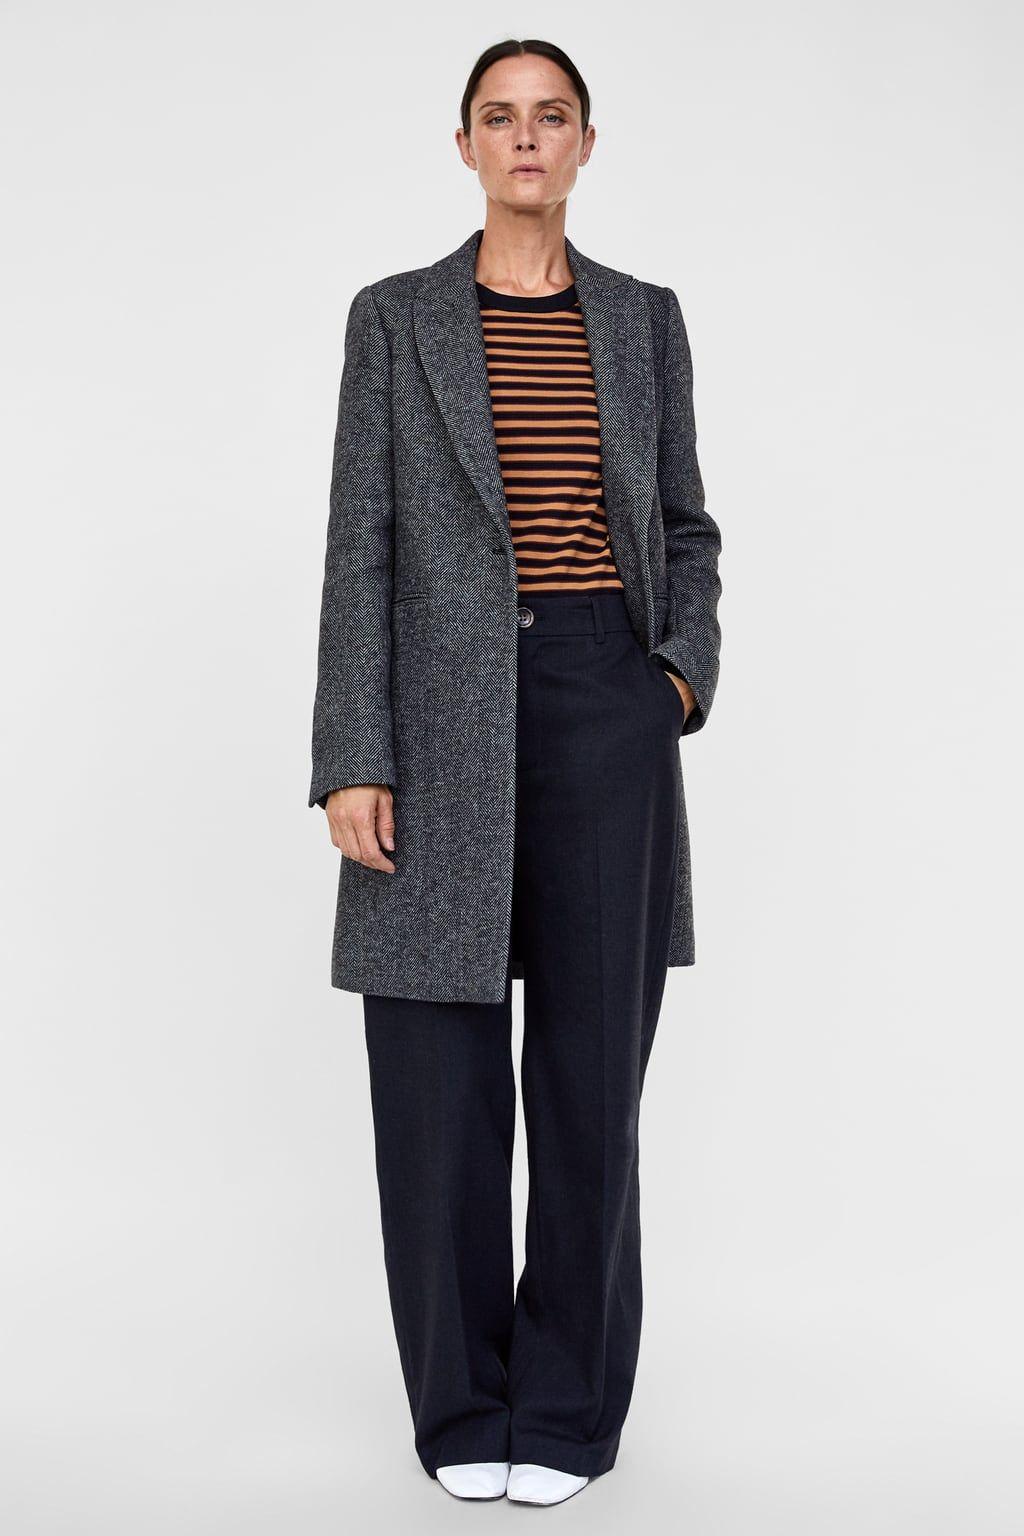 Zara schwarzer mantel fell